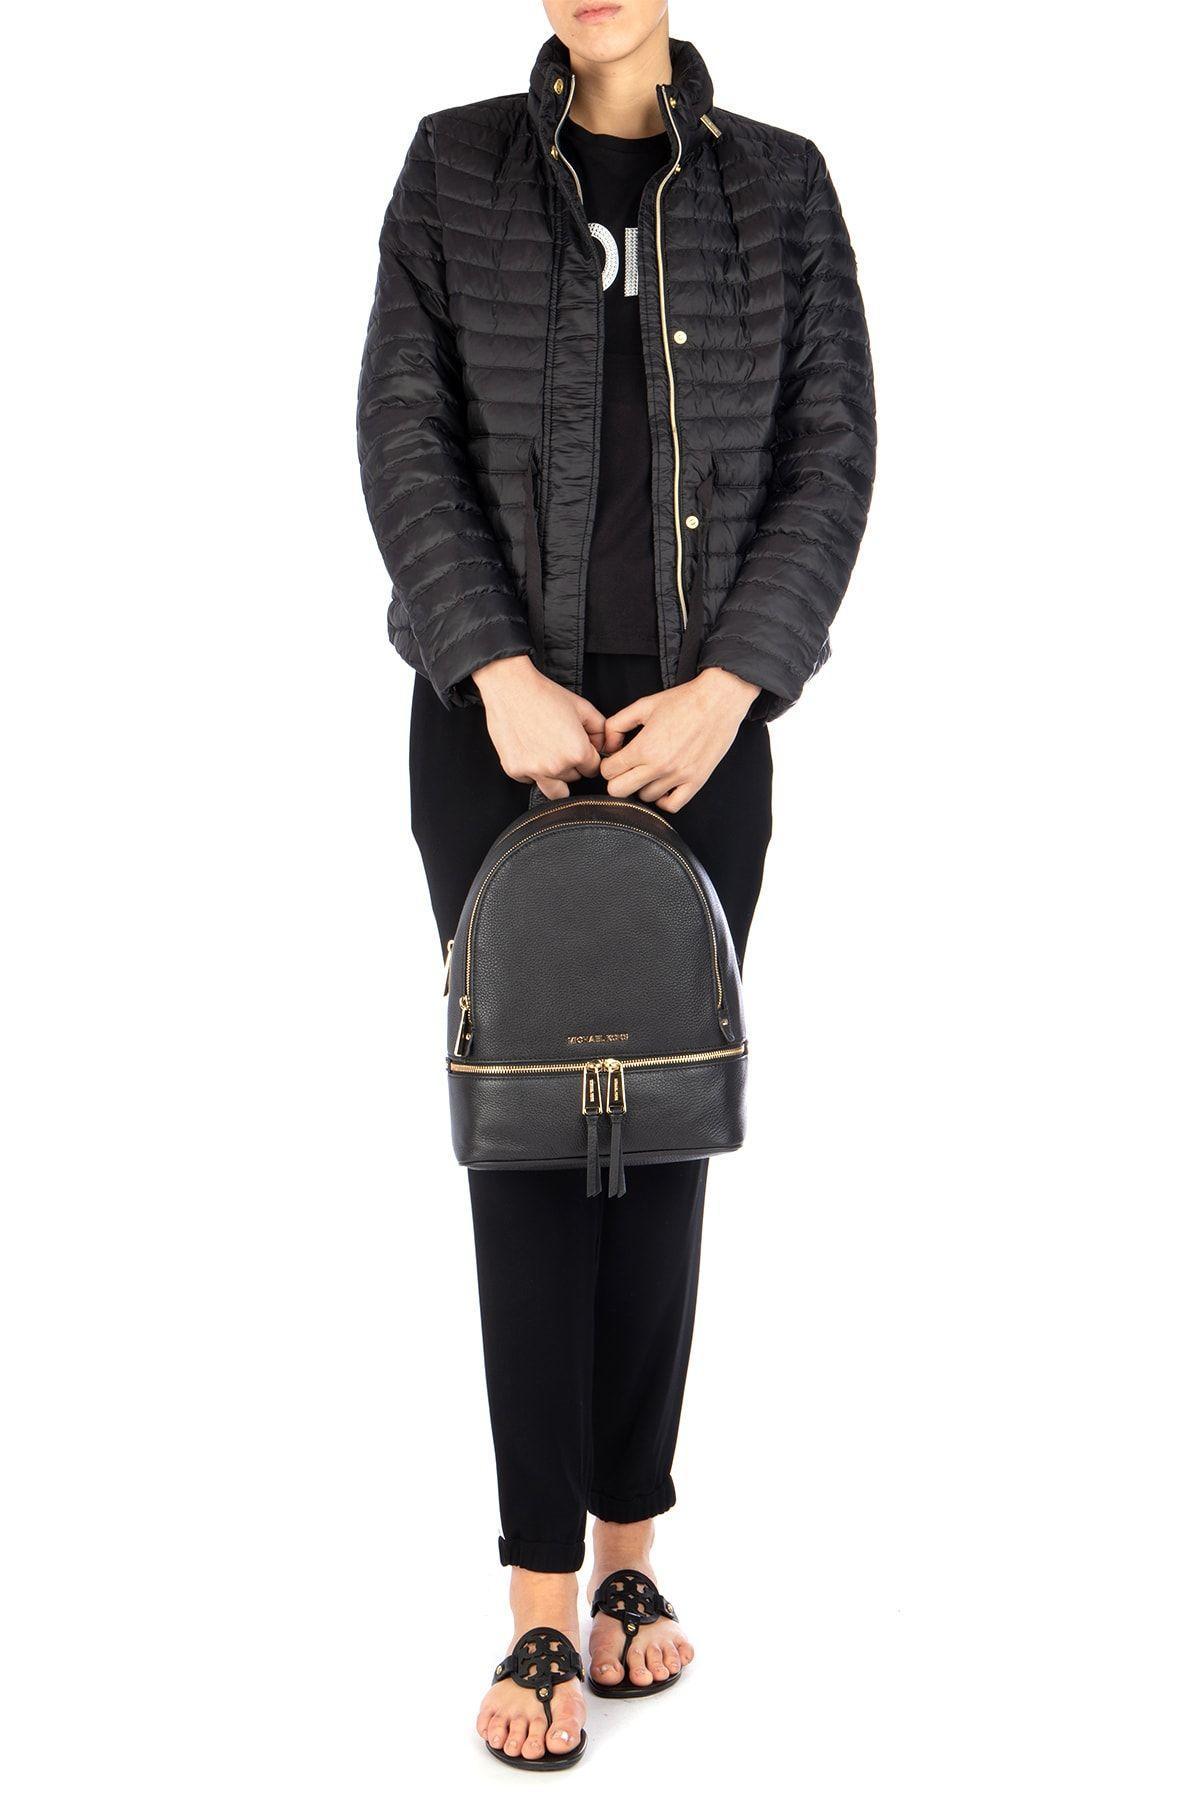 Michael Kors Michael Rhea Pebble Leather Backpack in Black - Save 27%